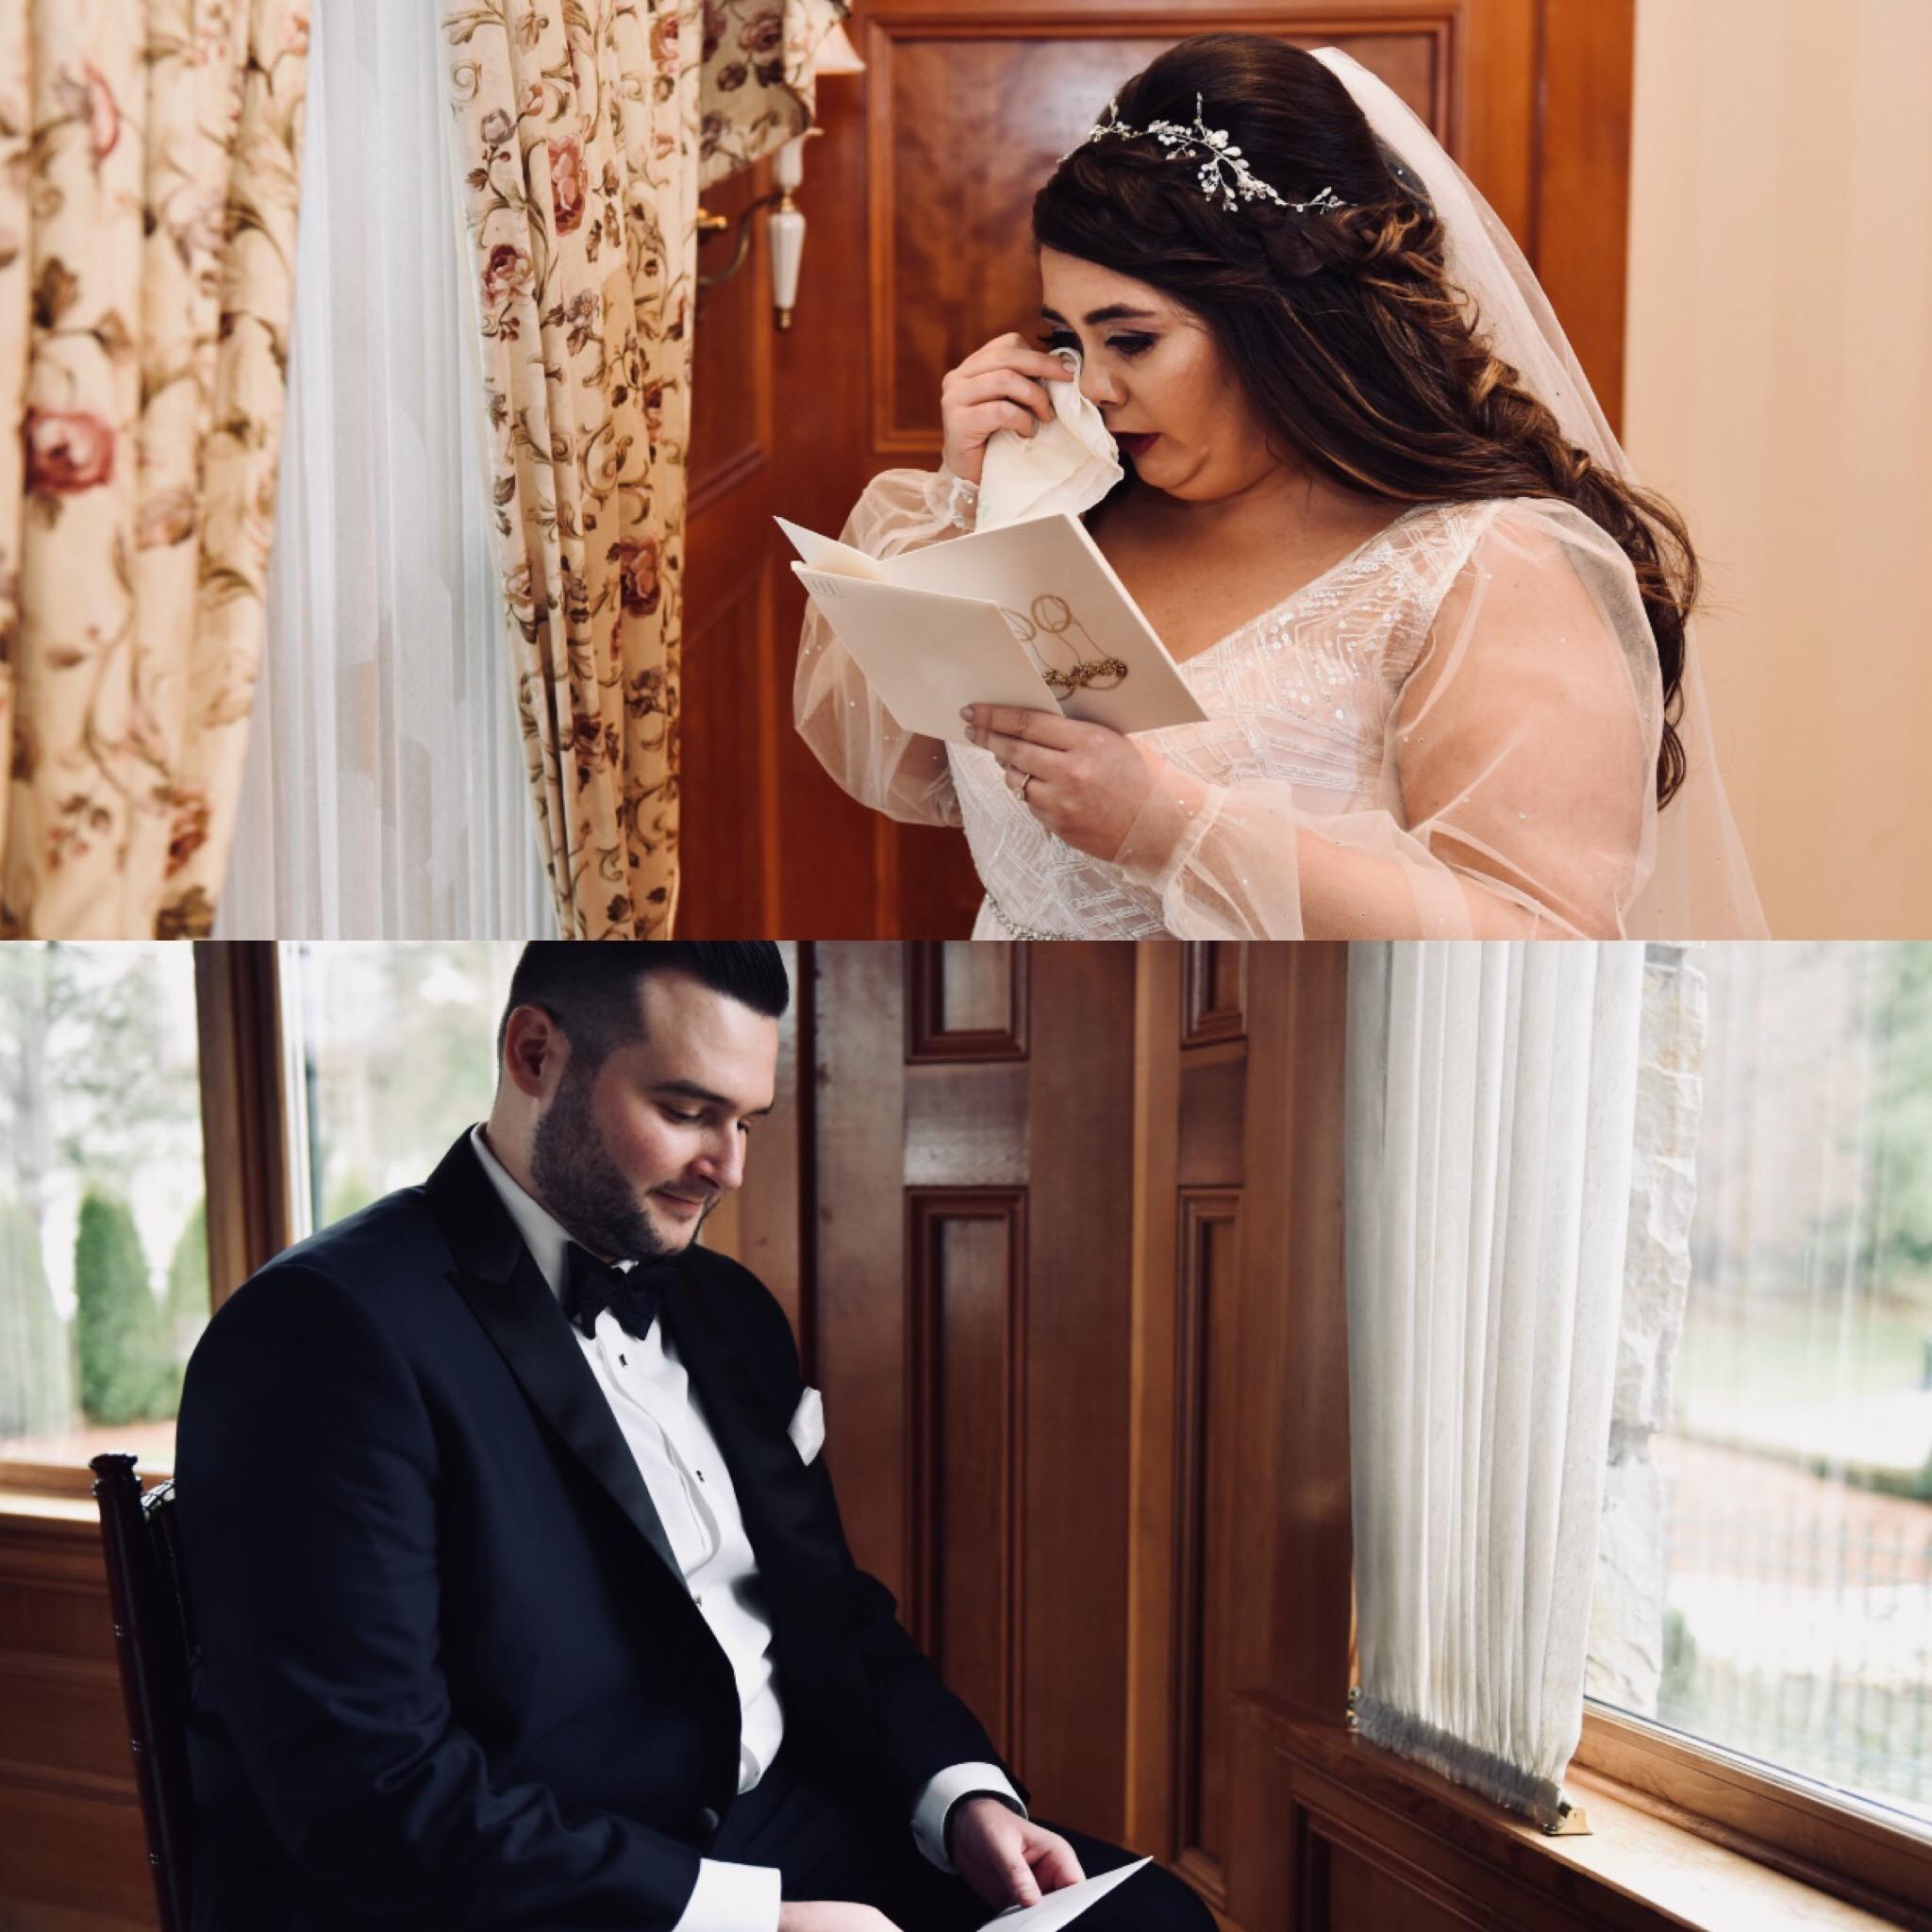 REAL WEDDING | Romantic Secret Garden Meets Rustic Lodge in Massachusetts | Keith Berry | Pretty Pear Bride